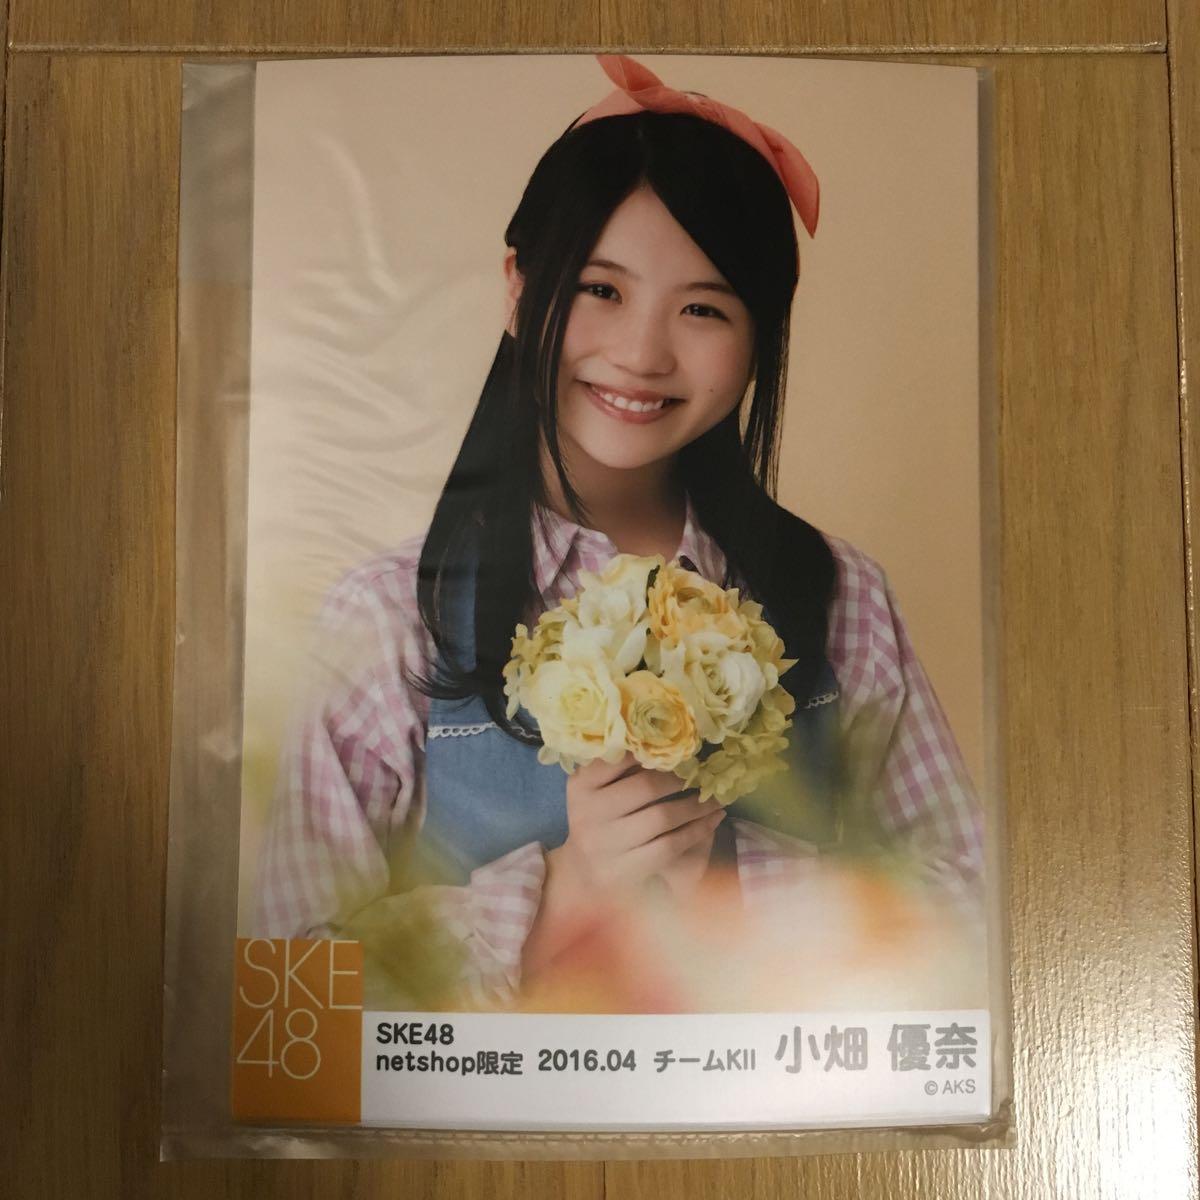 SKE48 小畑優奈 生写真 2016.4 netshop限定 5枚コンプ(未開封)